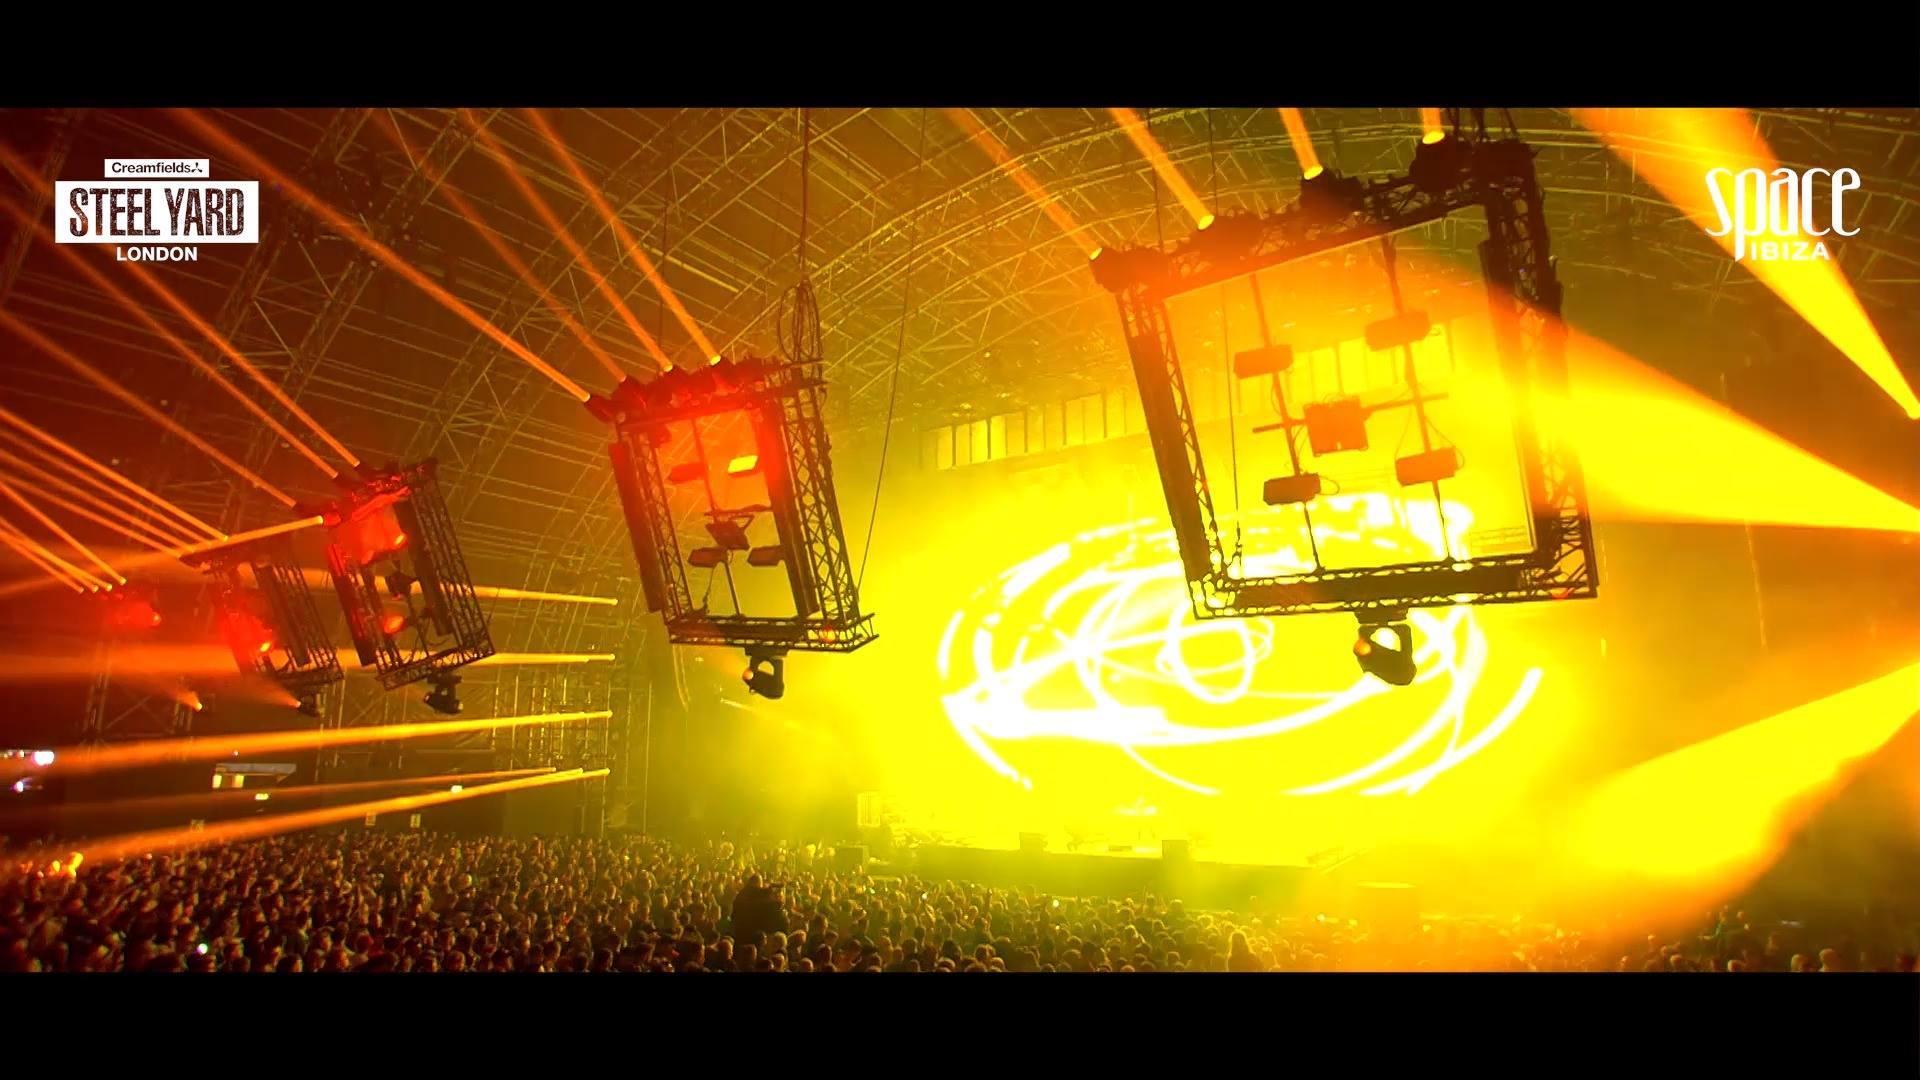 Space Ibiza & Carl Cox - Steel Yard London